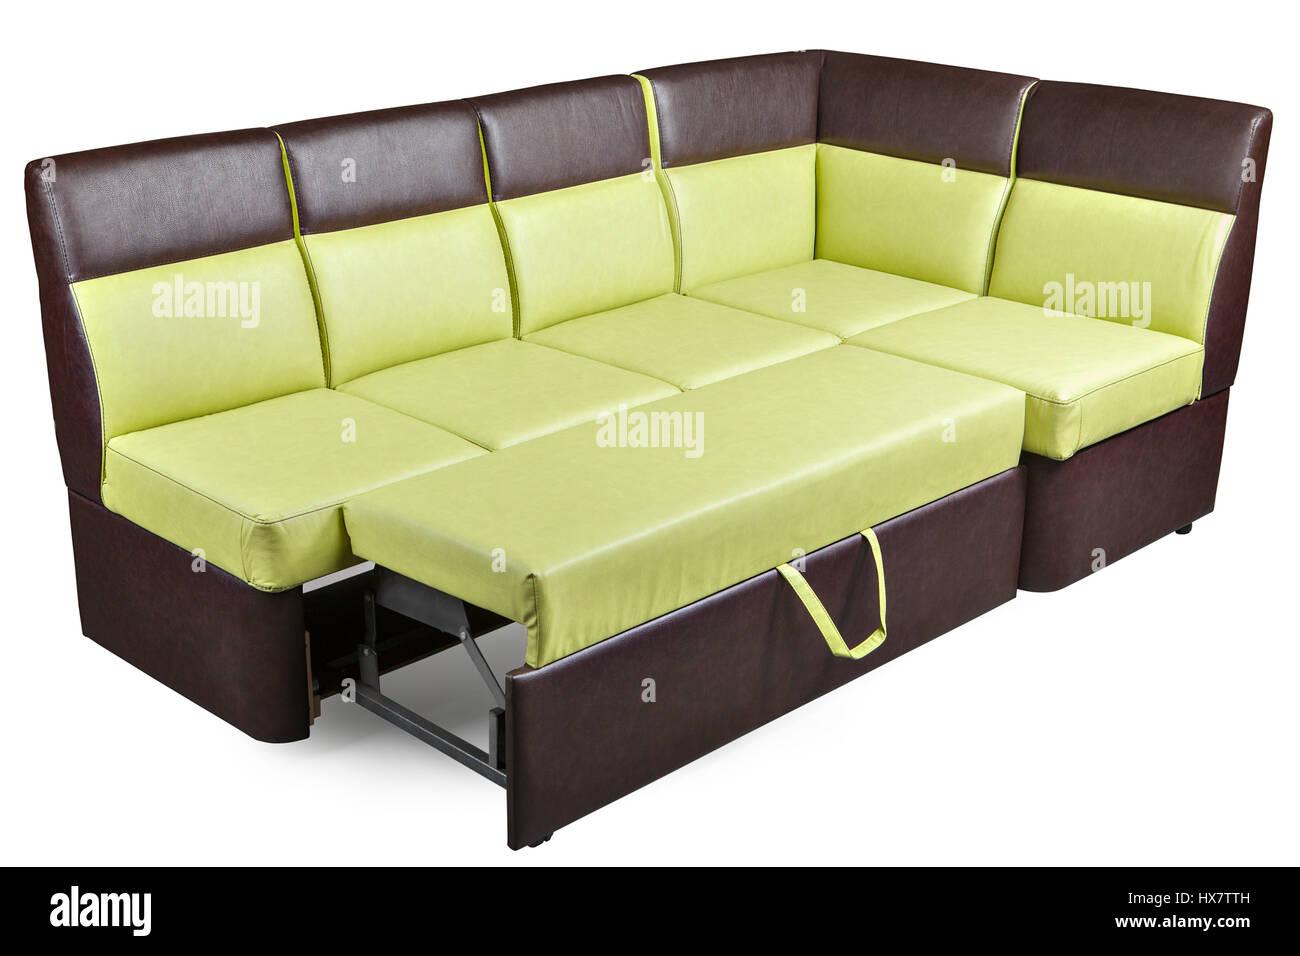 leatherette l shaped dining furniture corner bench decomposed stock photo 136626801 alamy. Black Bedroom Furniture Sets. Home Design Ideas